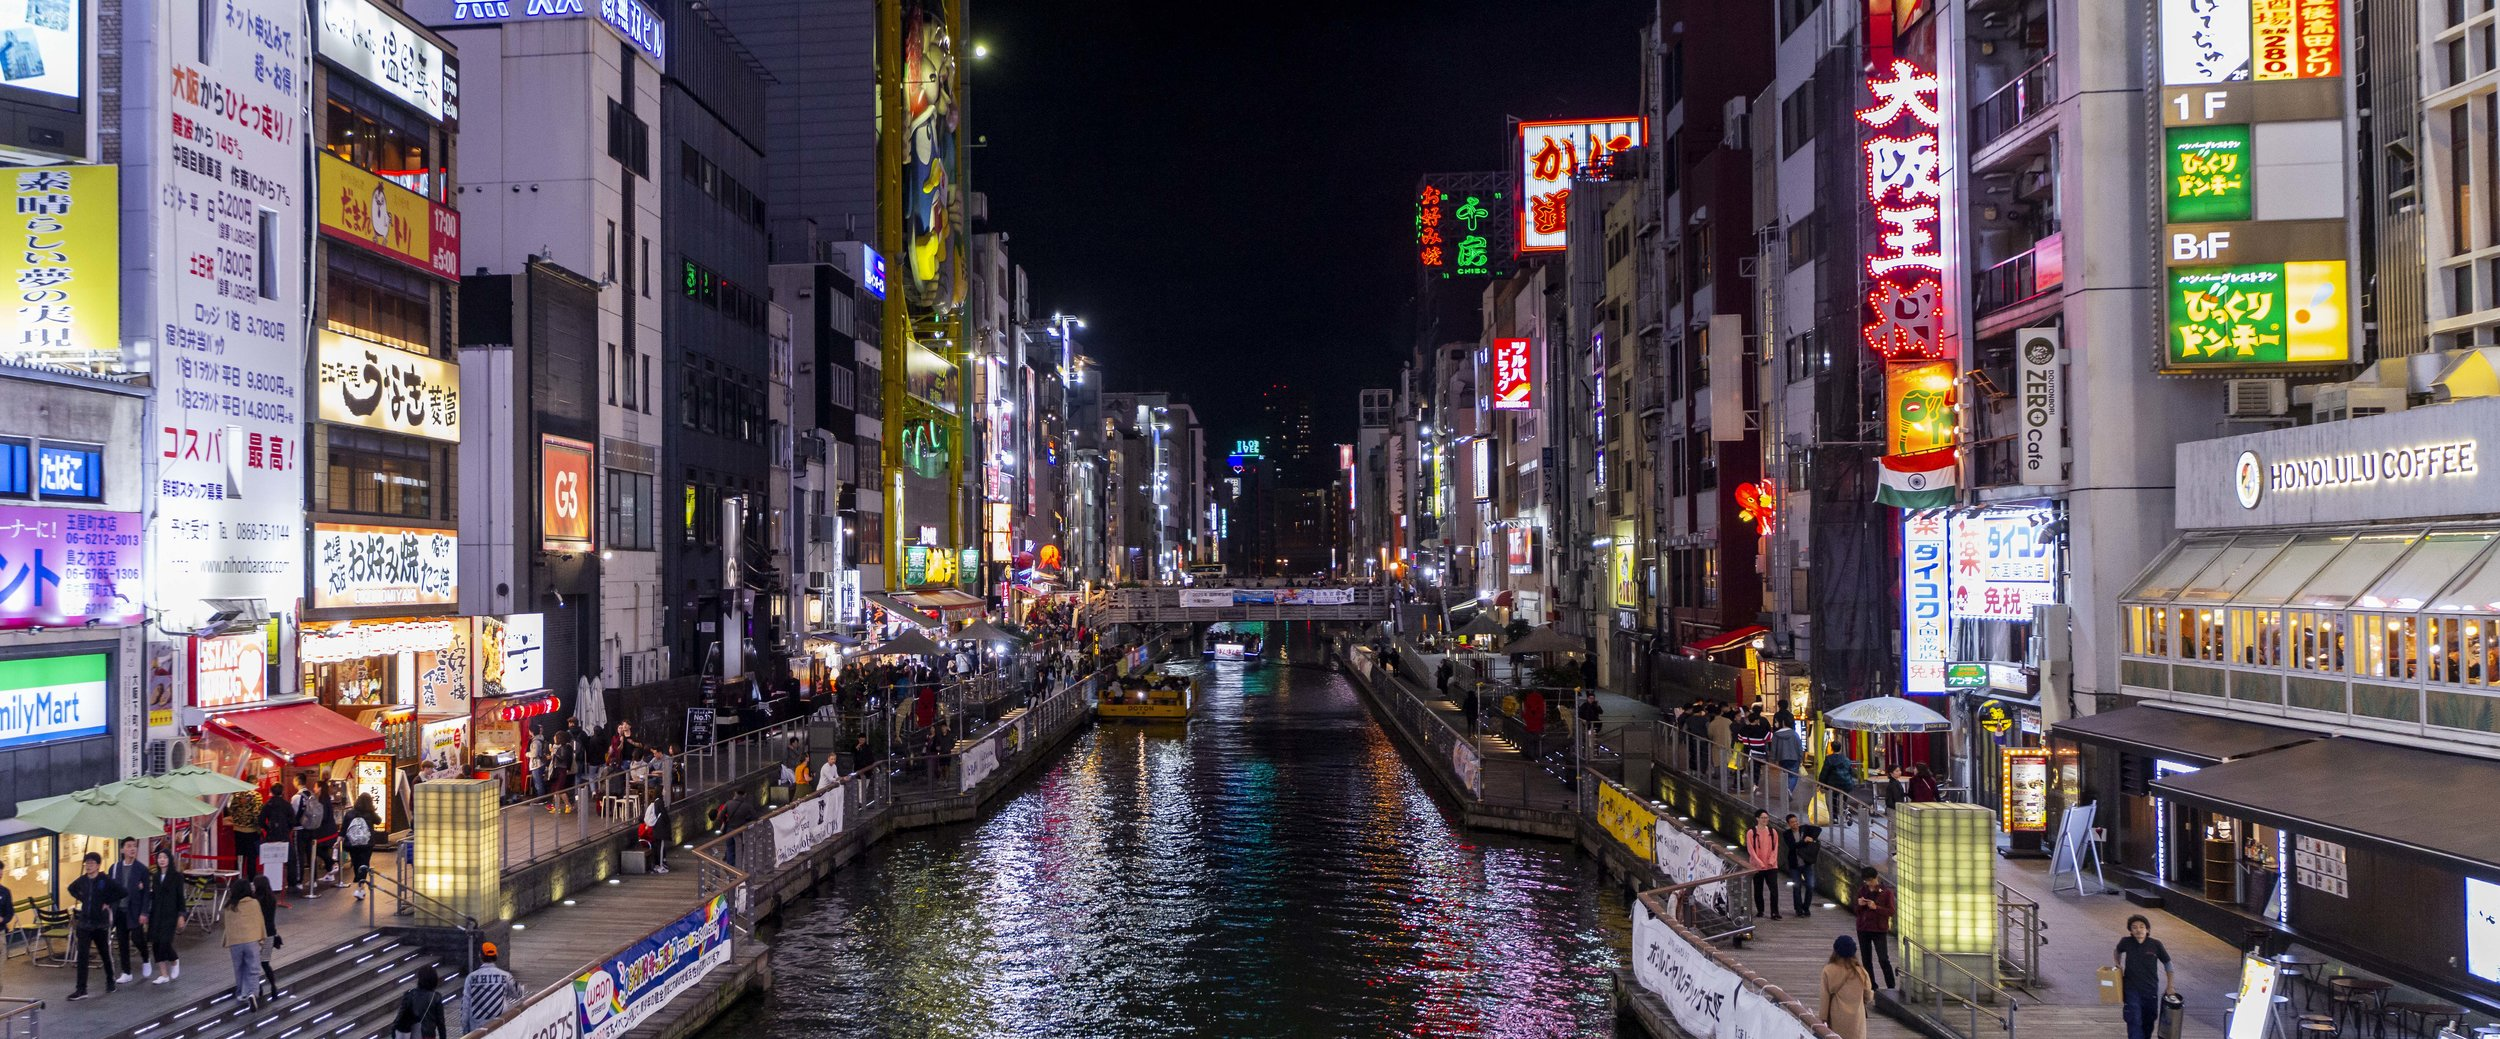 Dōtonbori Canal in Osaka